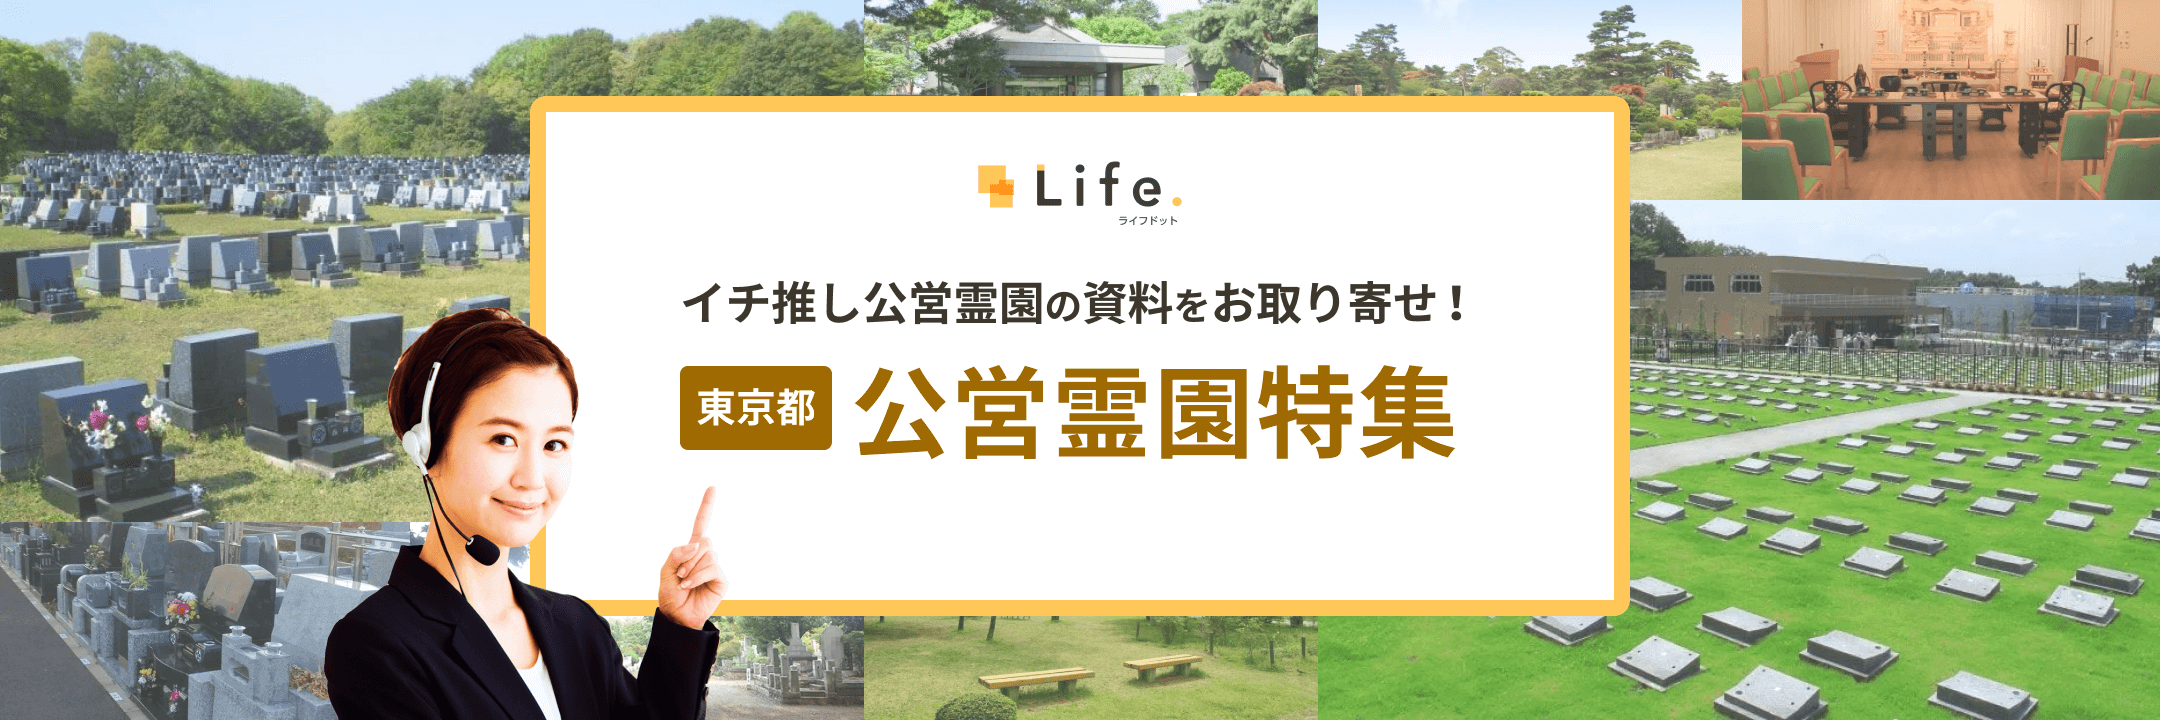 東京都イチ推し公営霊園特集